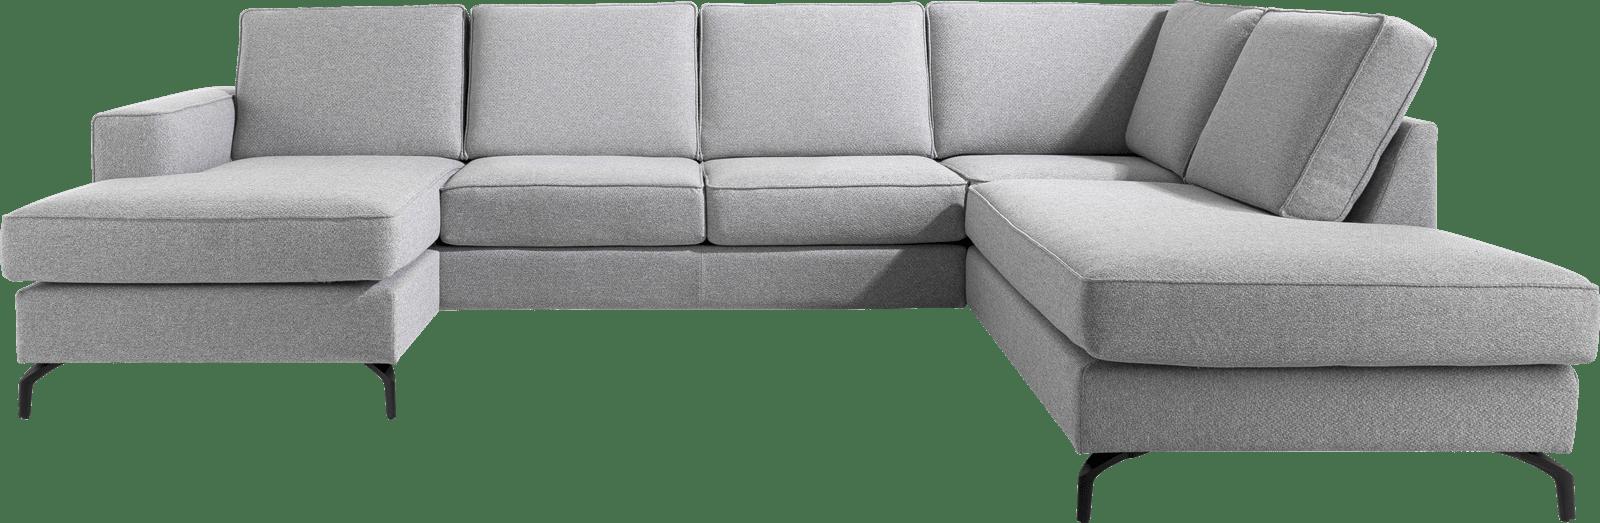 XOOON - Varna - Salons - longchair + 3-zits + ottomane rechts